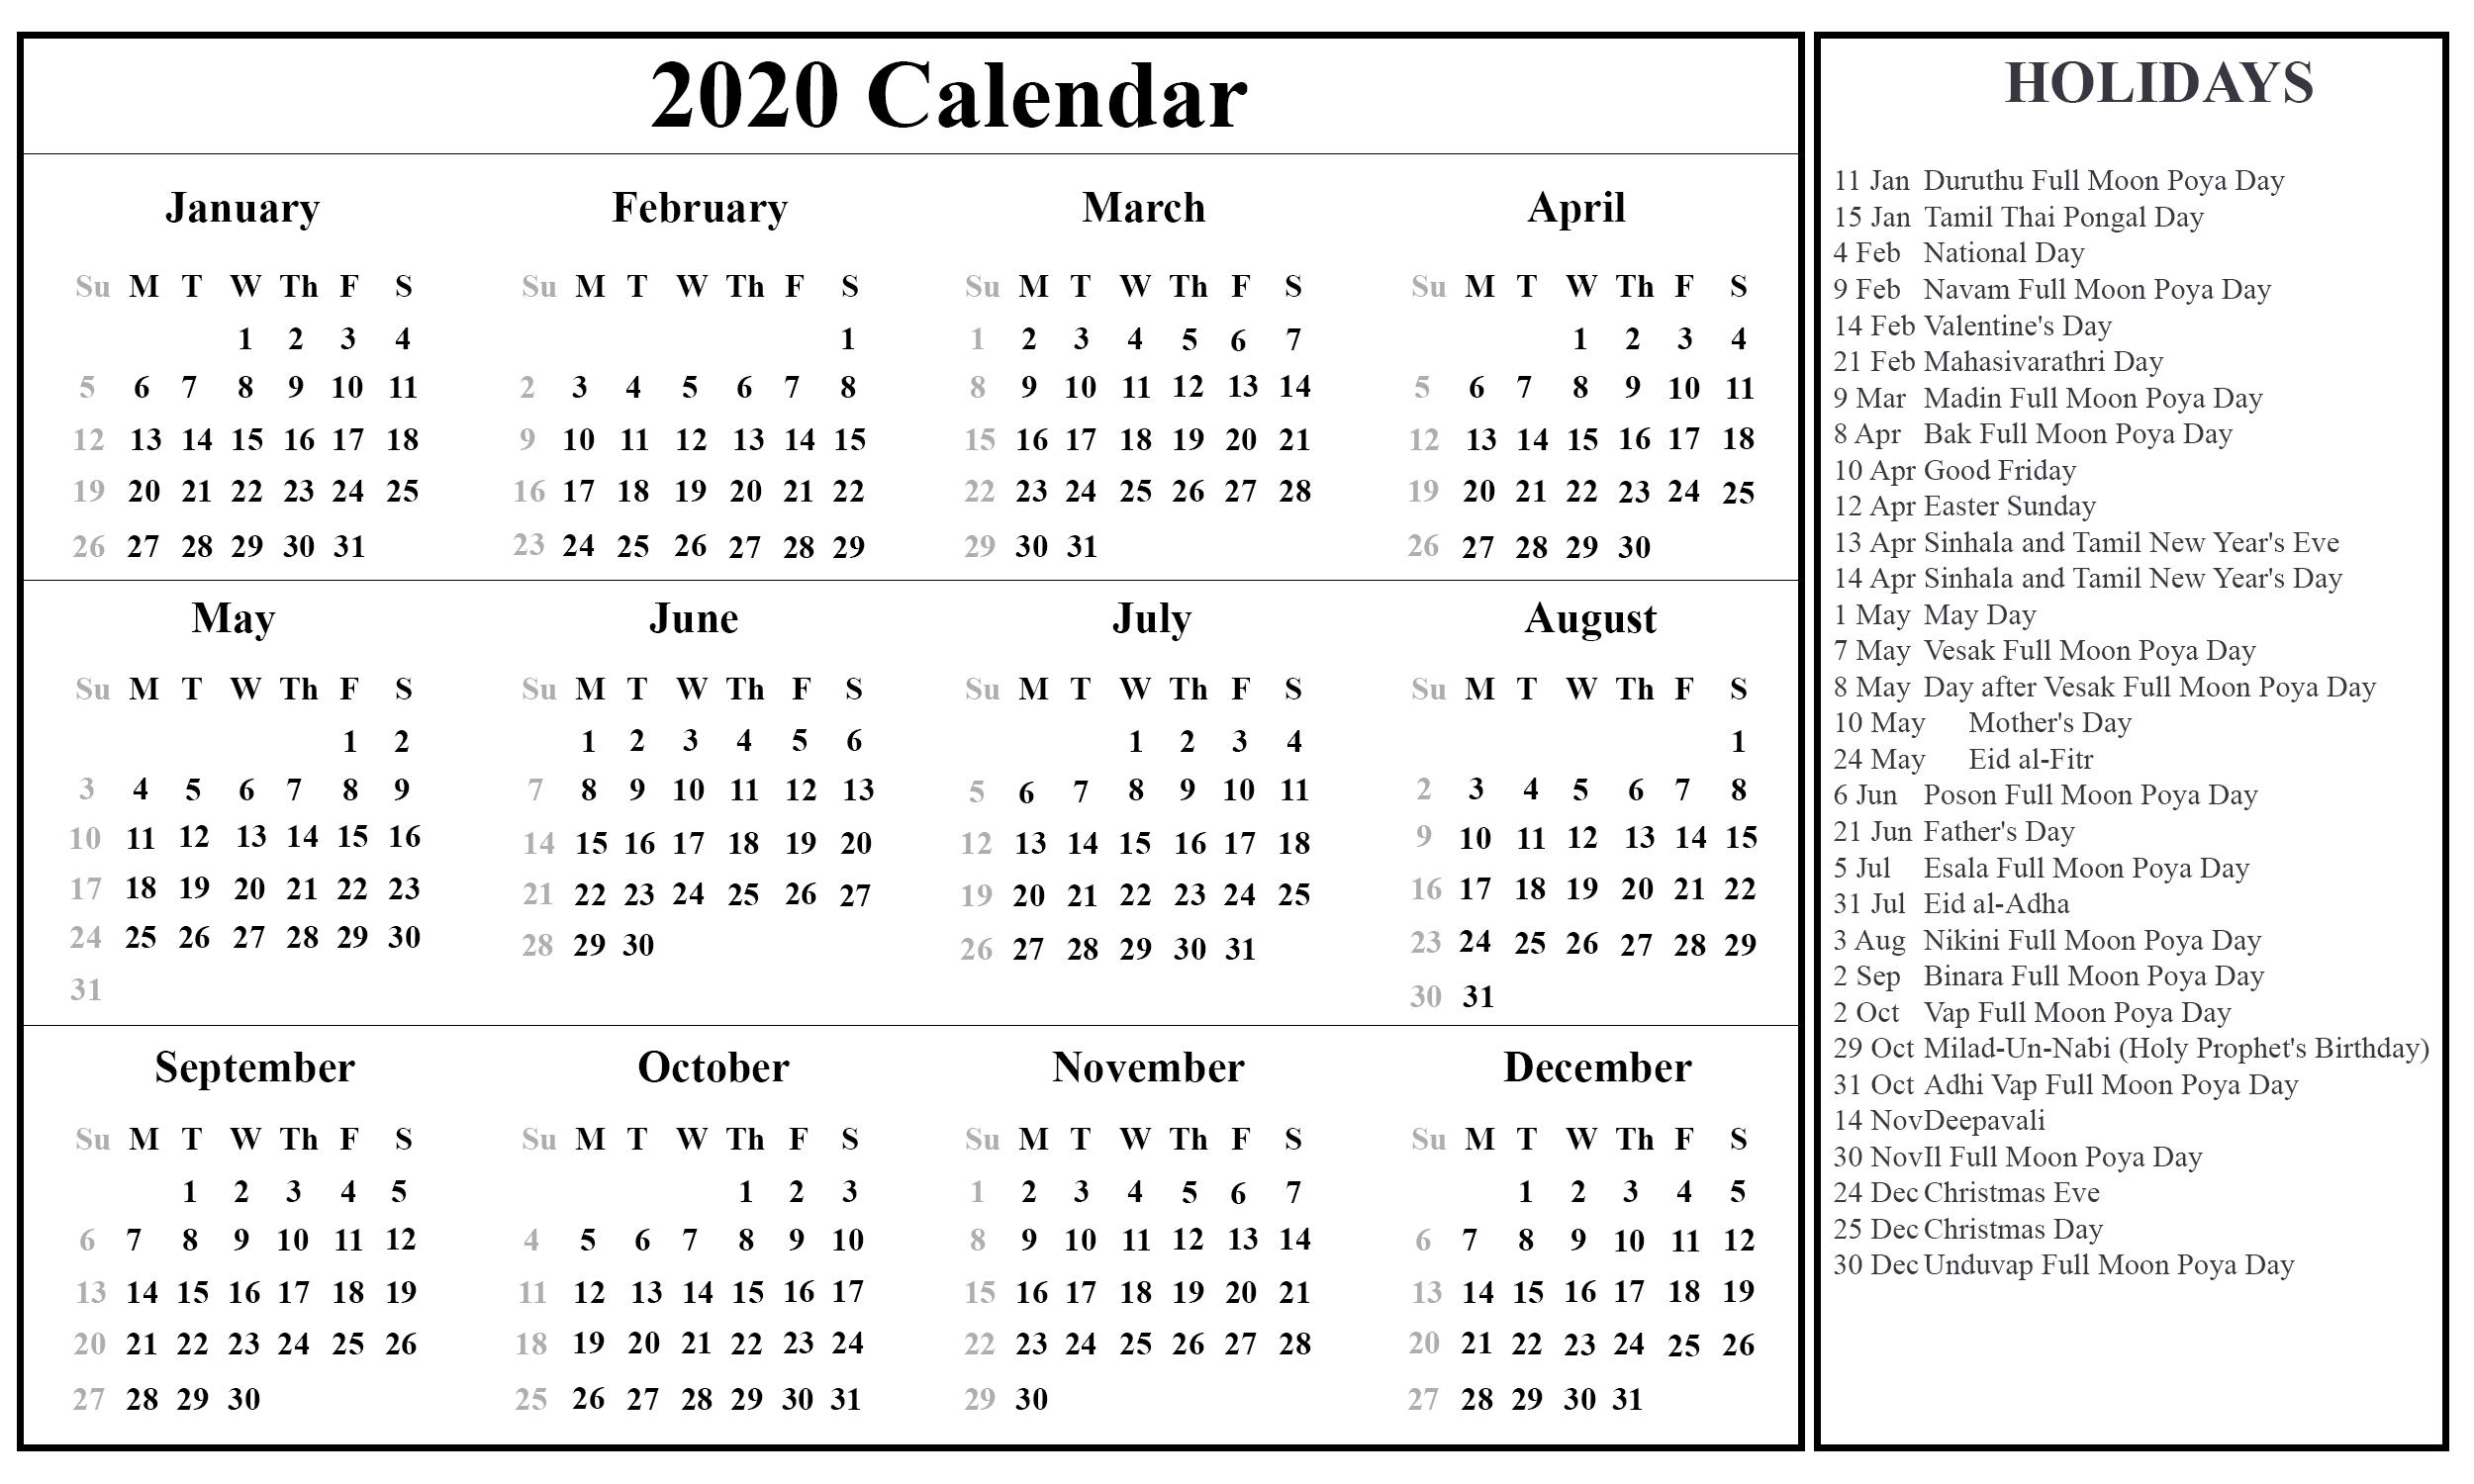 Free Printable Sri Lanka Calendar 2020 With Holidays In Pdf-January 2020 Calendar Sri Lanka